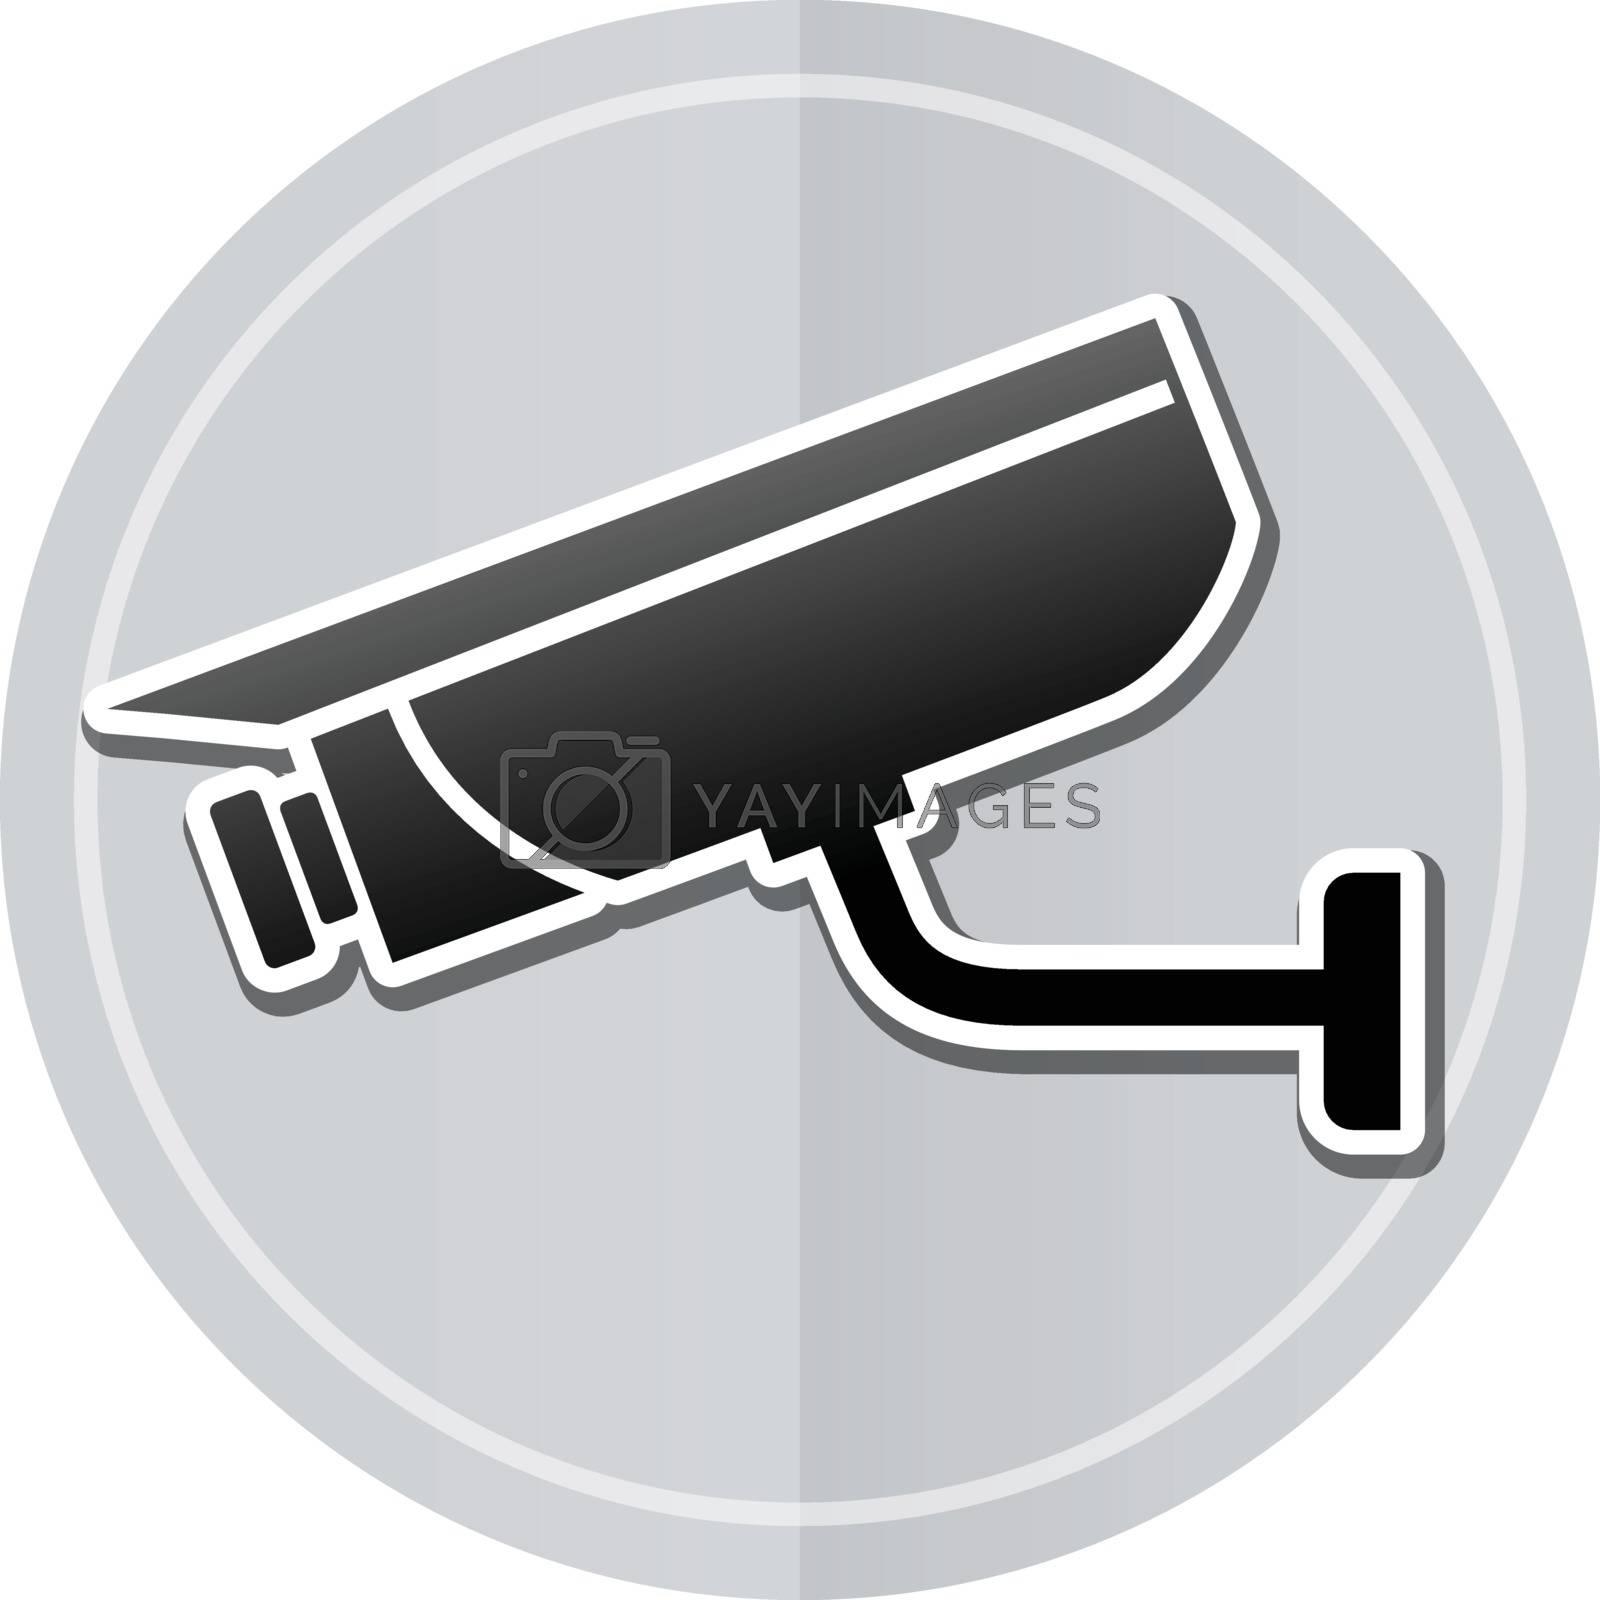 Illustration of video surveillance sticker icon simple design